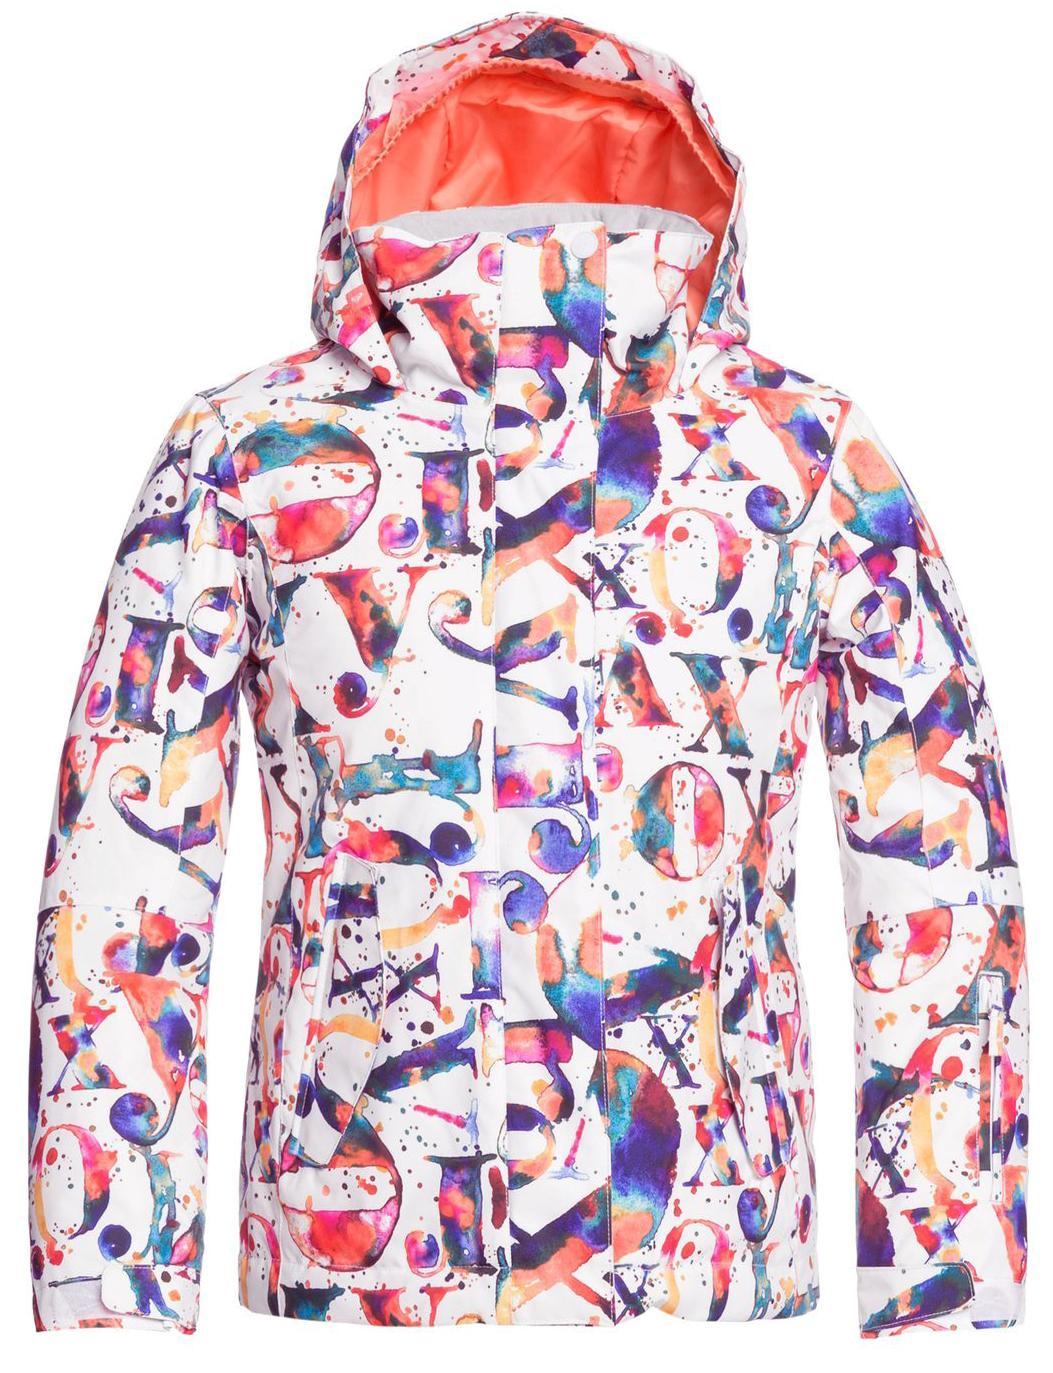 Куртка Сноубордическая Roxy 2020-21 Rx Jetty Bright White Magic Carpet (Возраст:8)